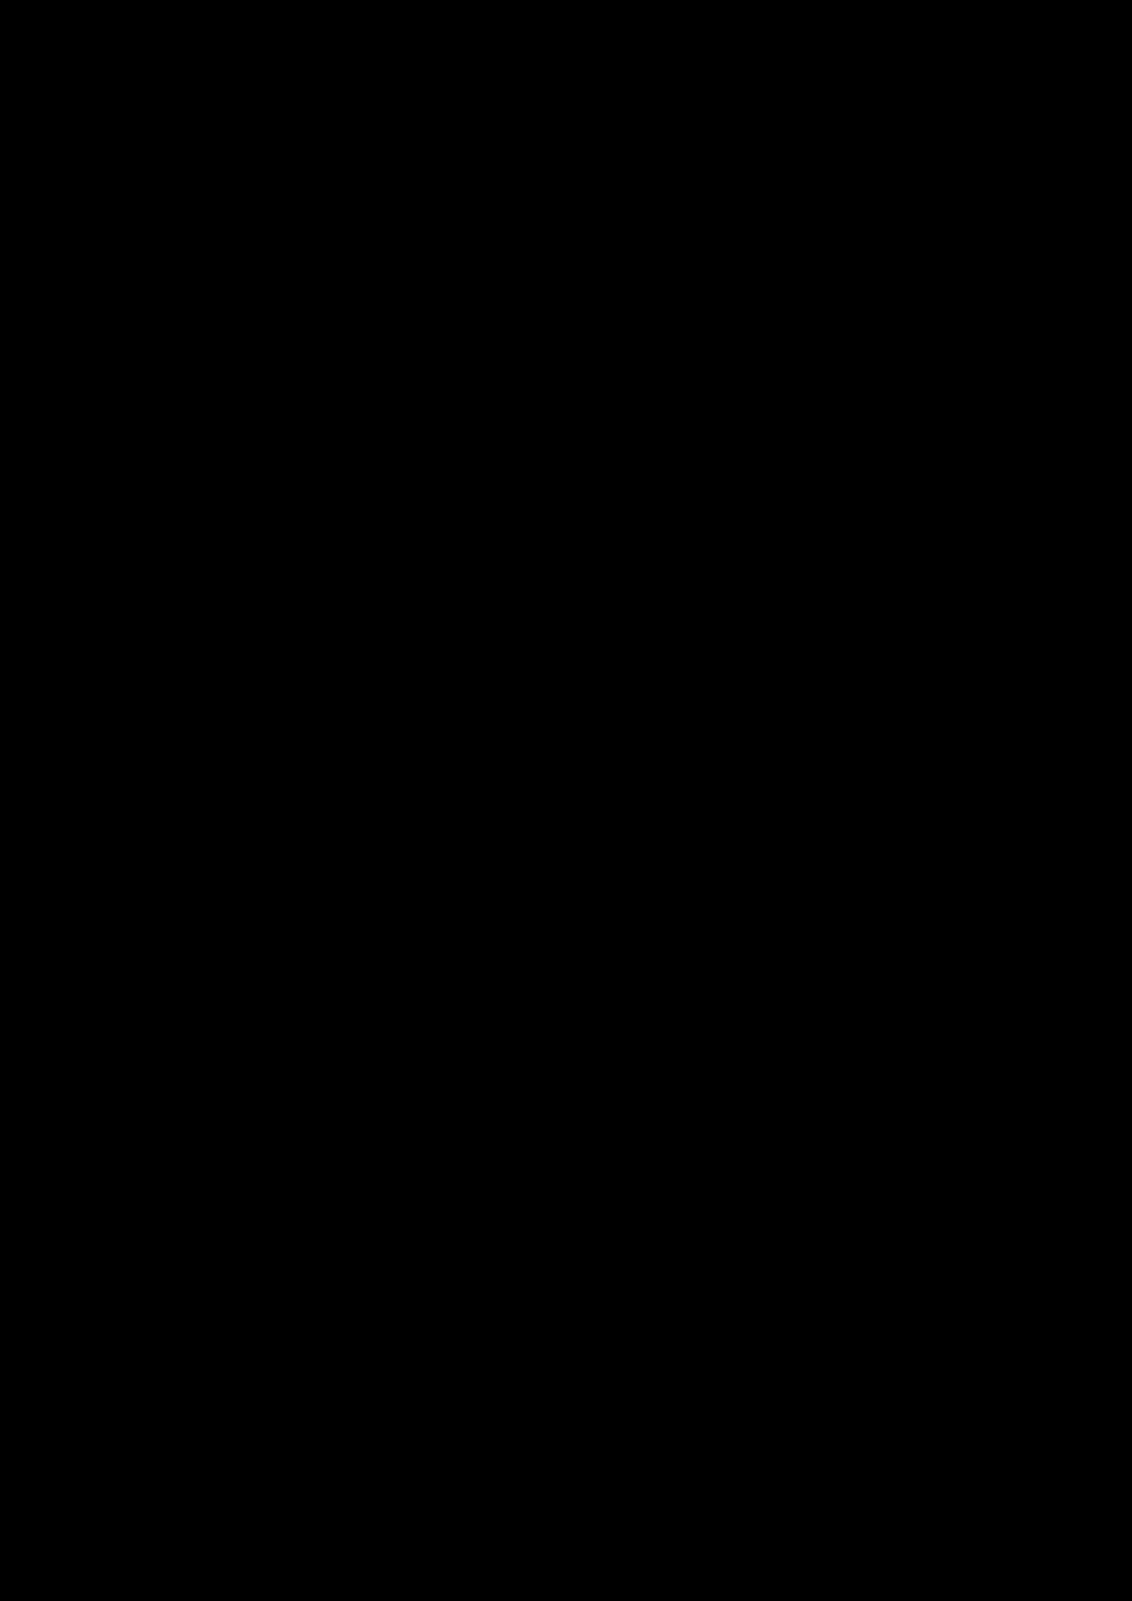 Korolevstvo slez slide, Image 28